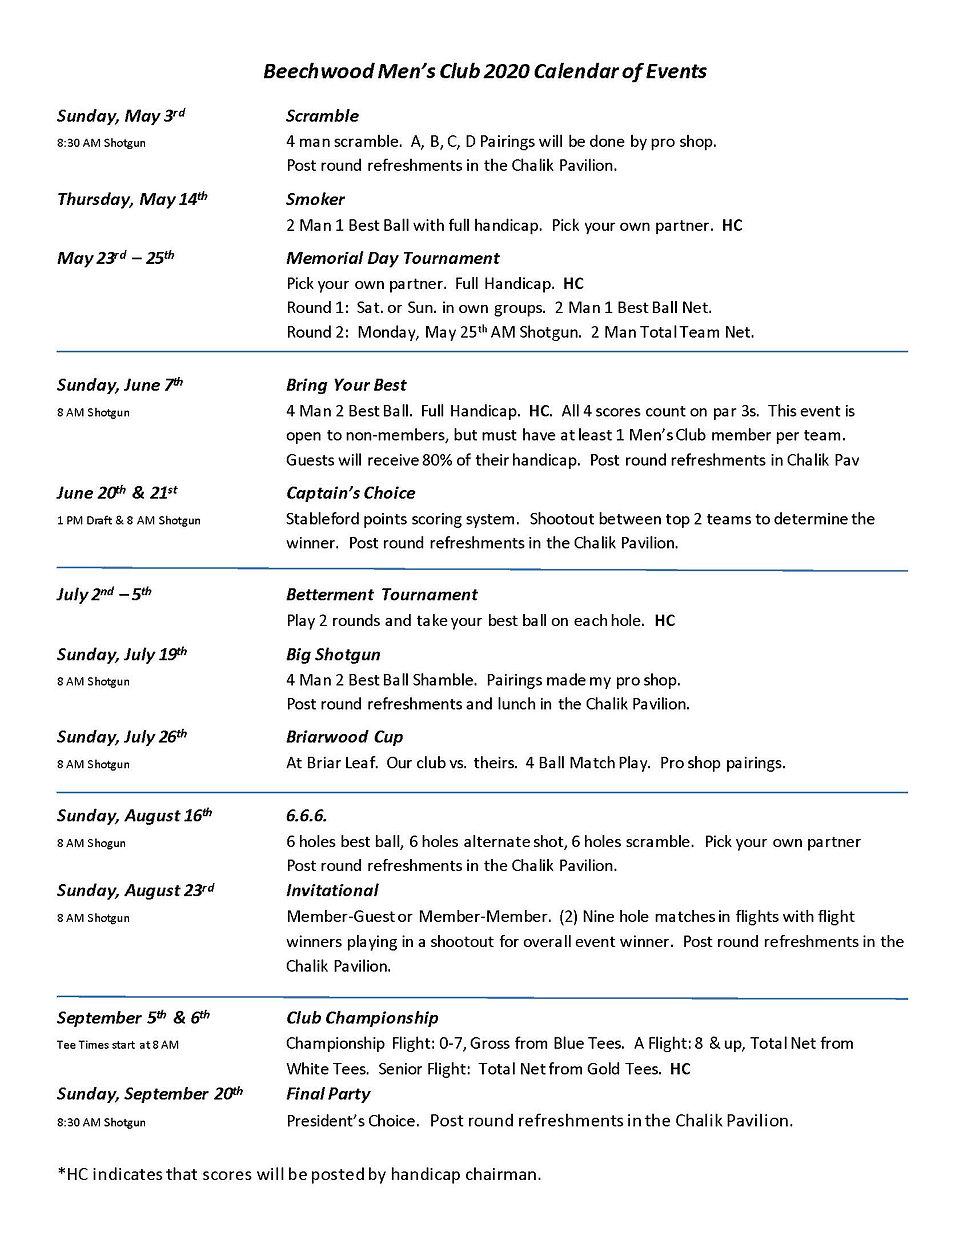 Men's Club Calendar 2020_Page_1.jpg